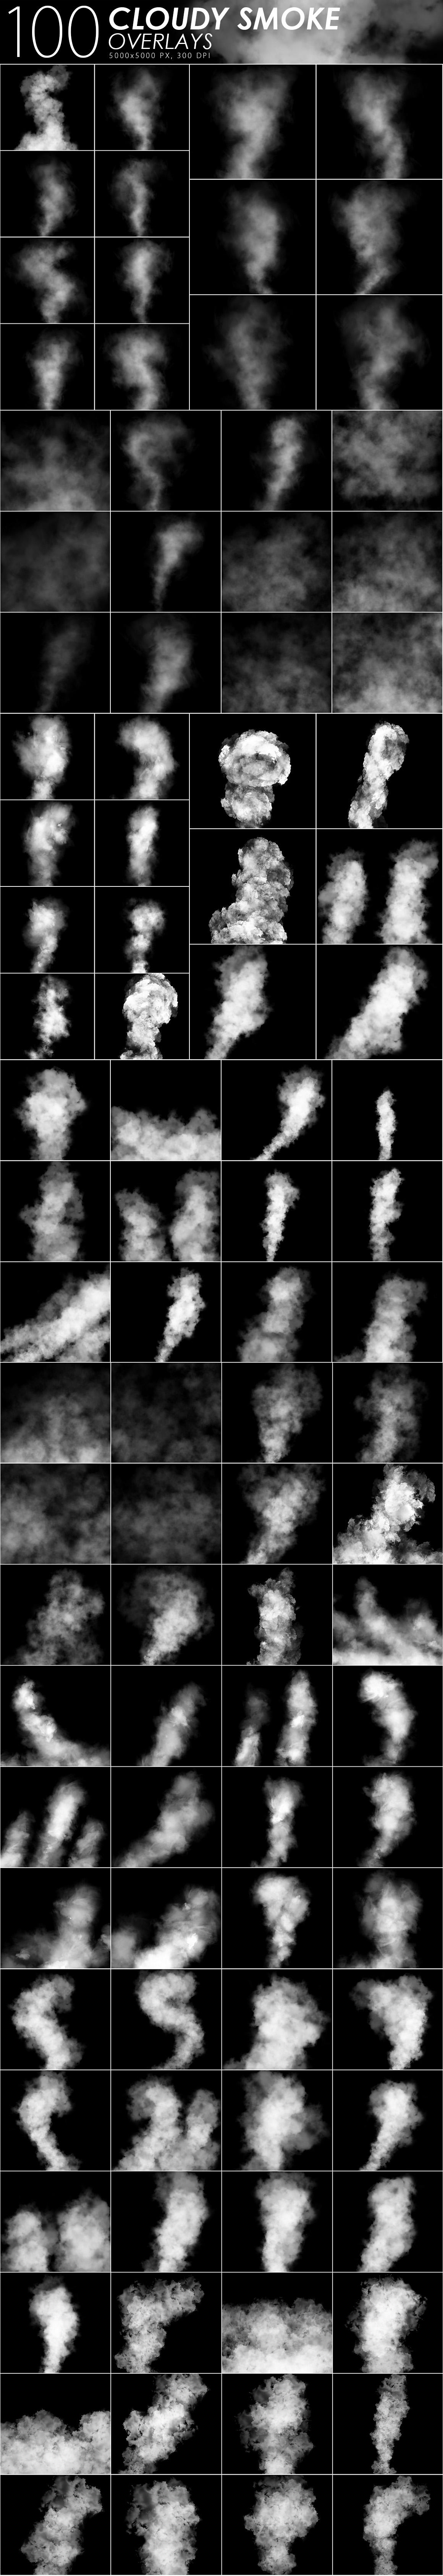 575 Fire, Smoke, Fog Overlays example image 10